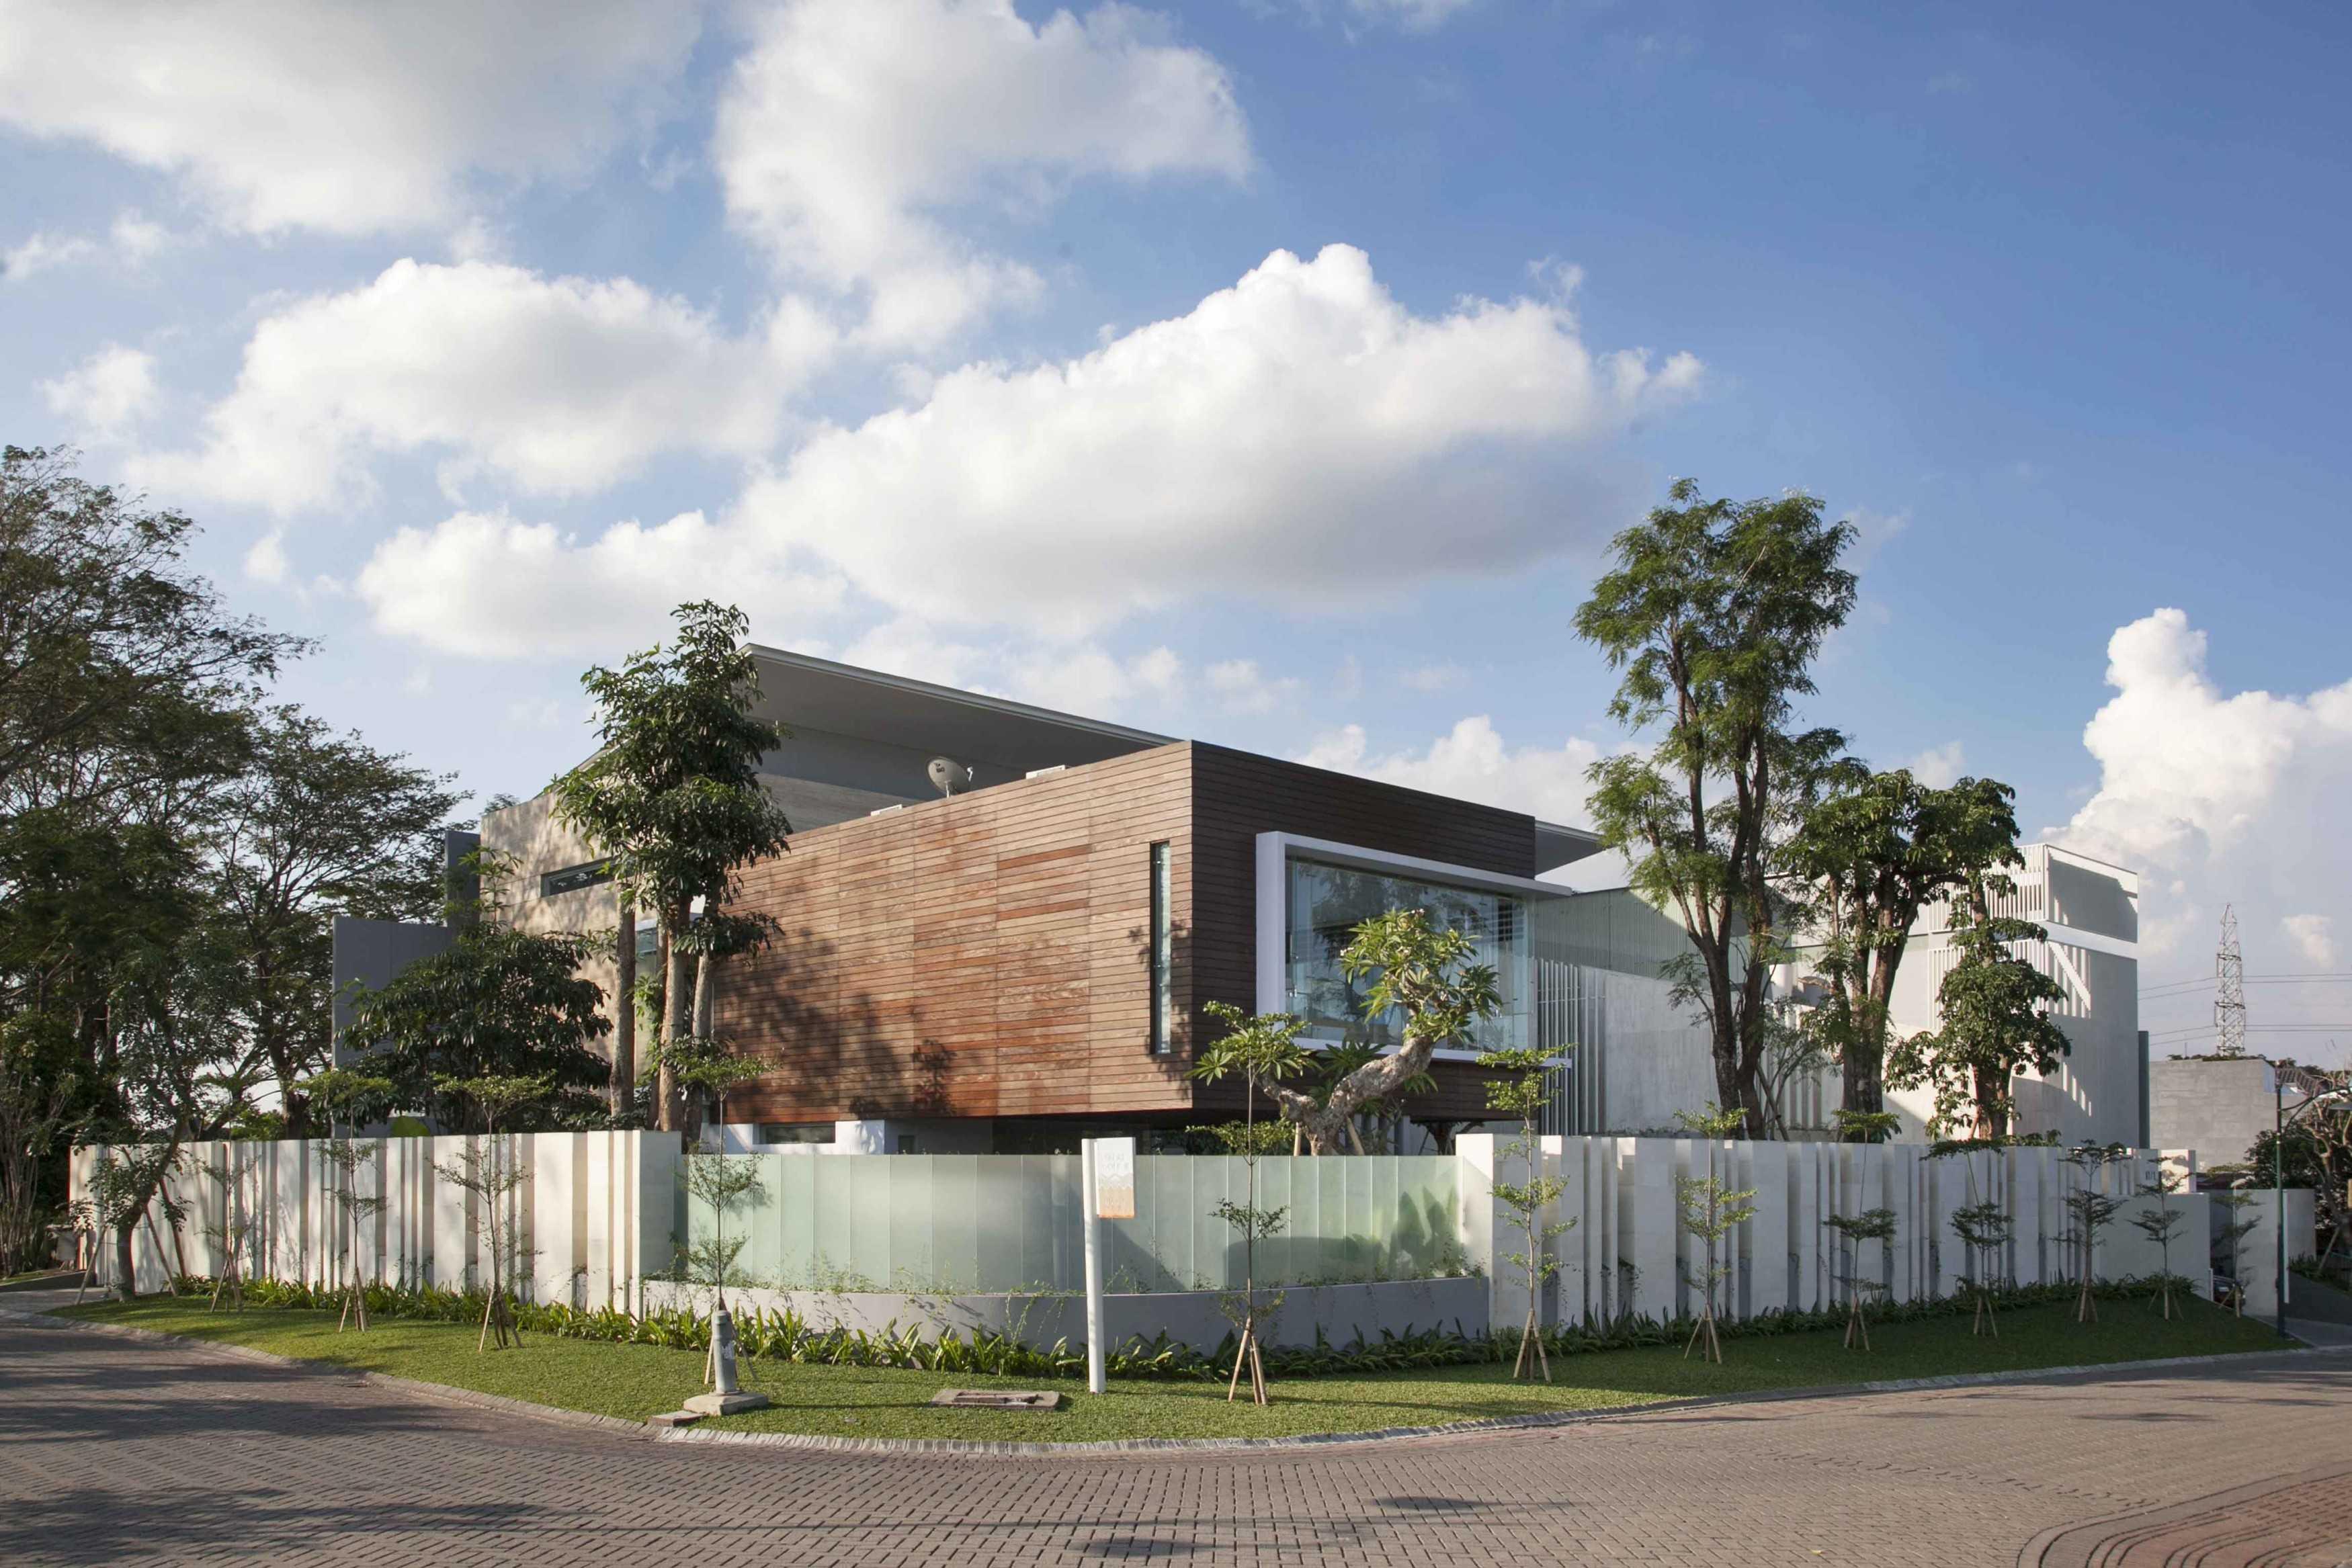 Das Quadrat Selat House Surabaya, Indonesia Surabaya, Indonesia Street View At Day   9368